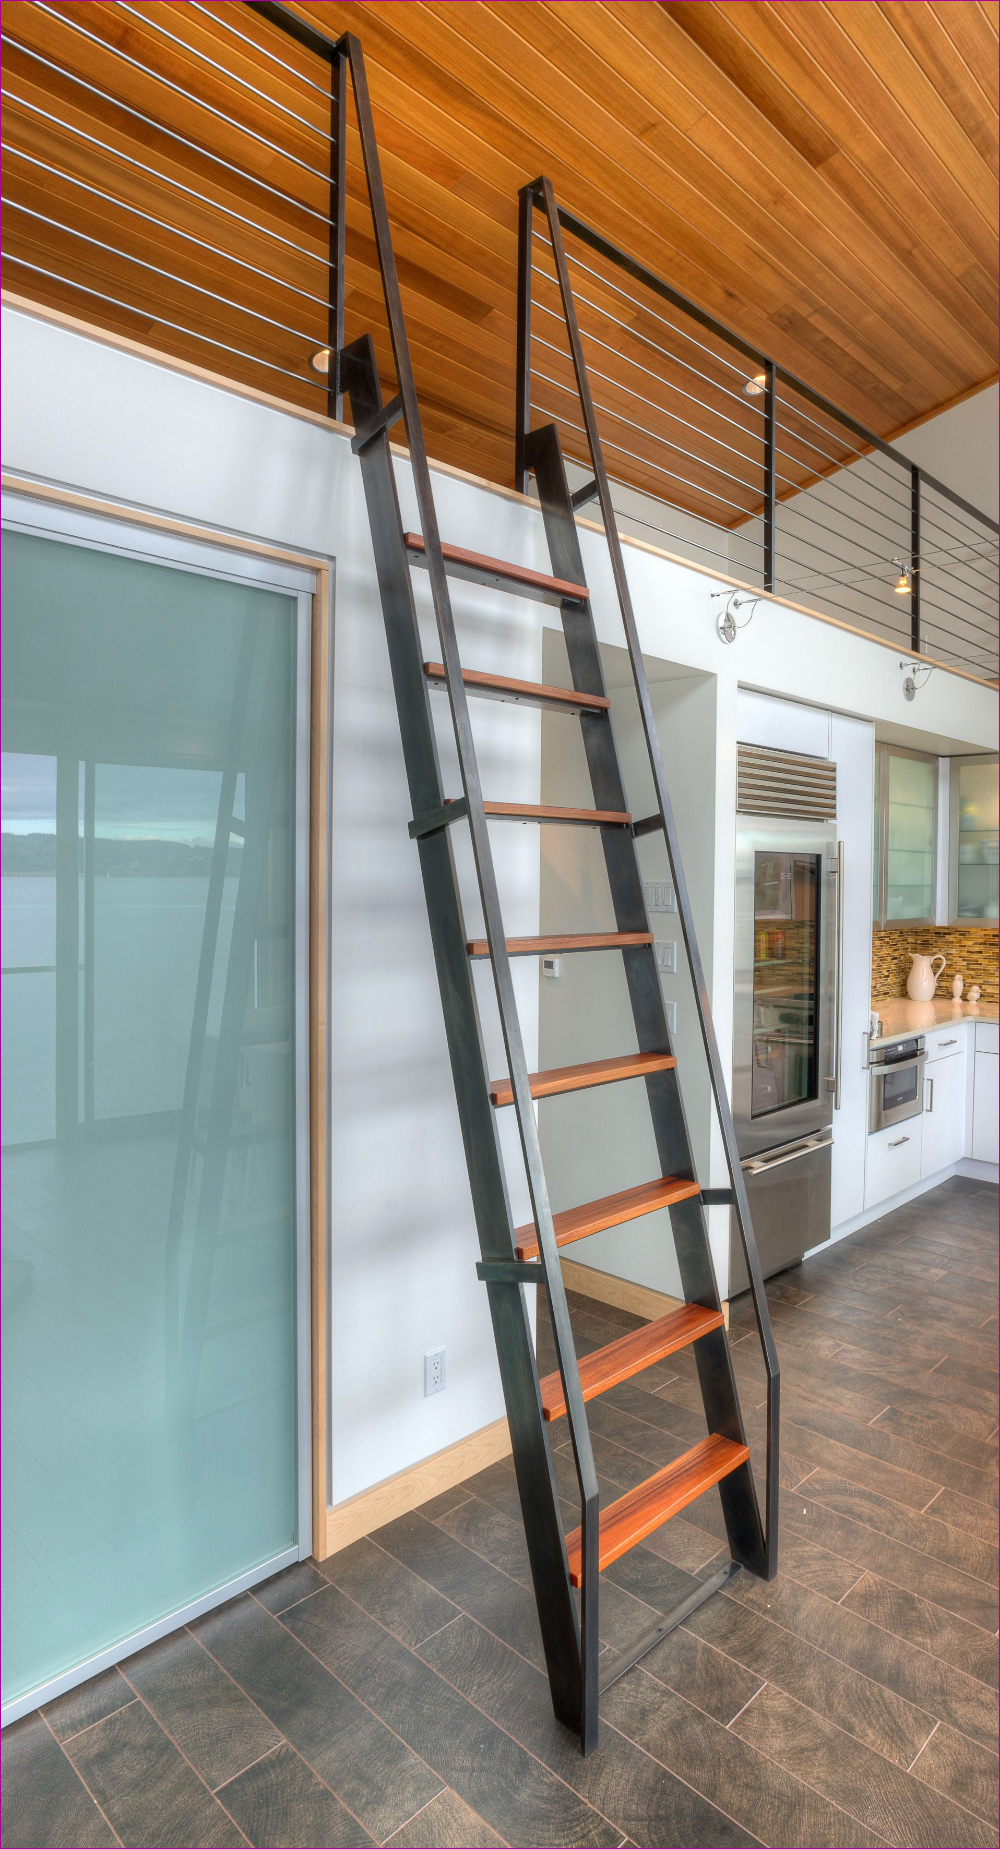 22 Joli Escalier Escamotable Pour Mezzanine Escalier Escamotable Escalier De Loft Echelle Escalier